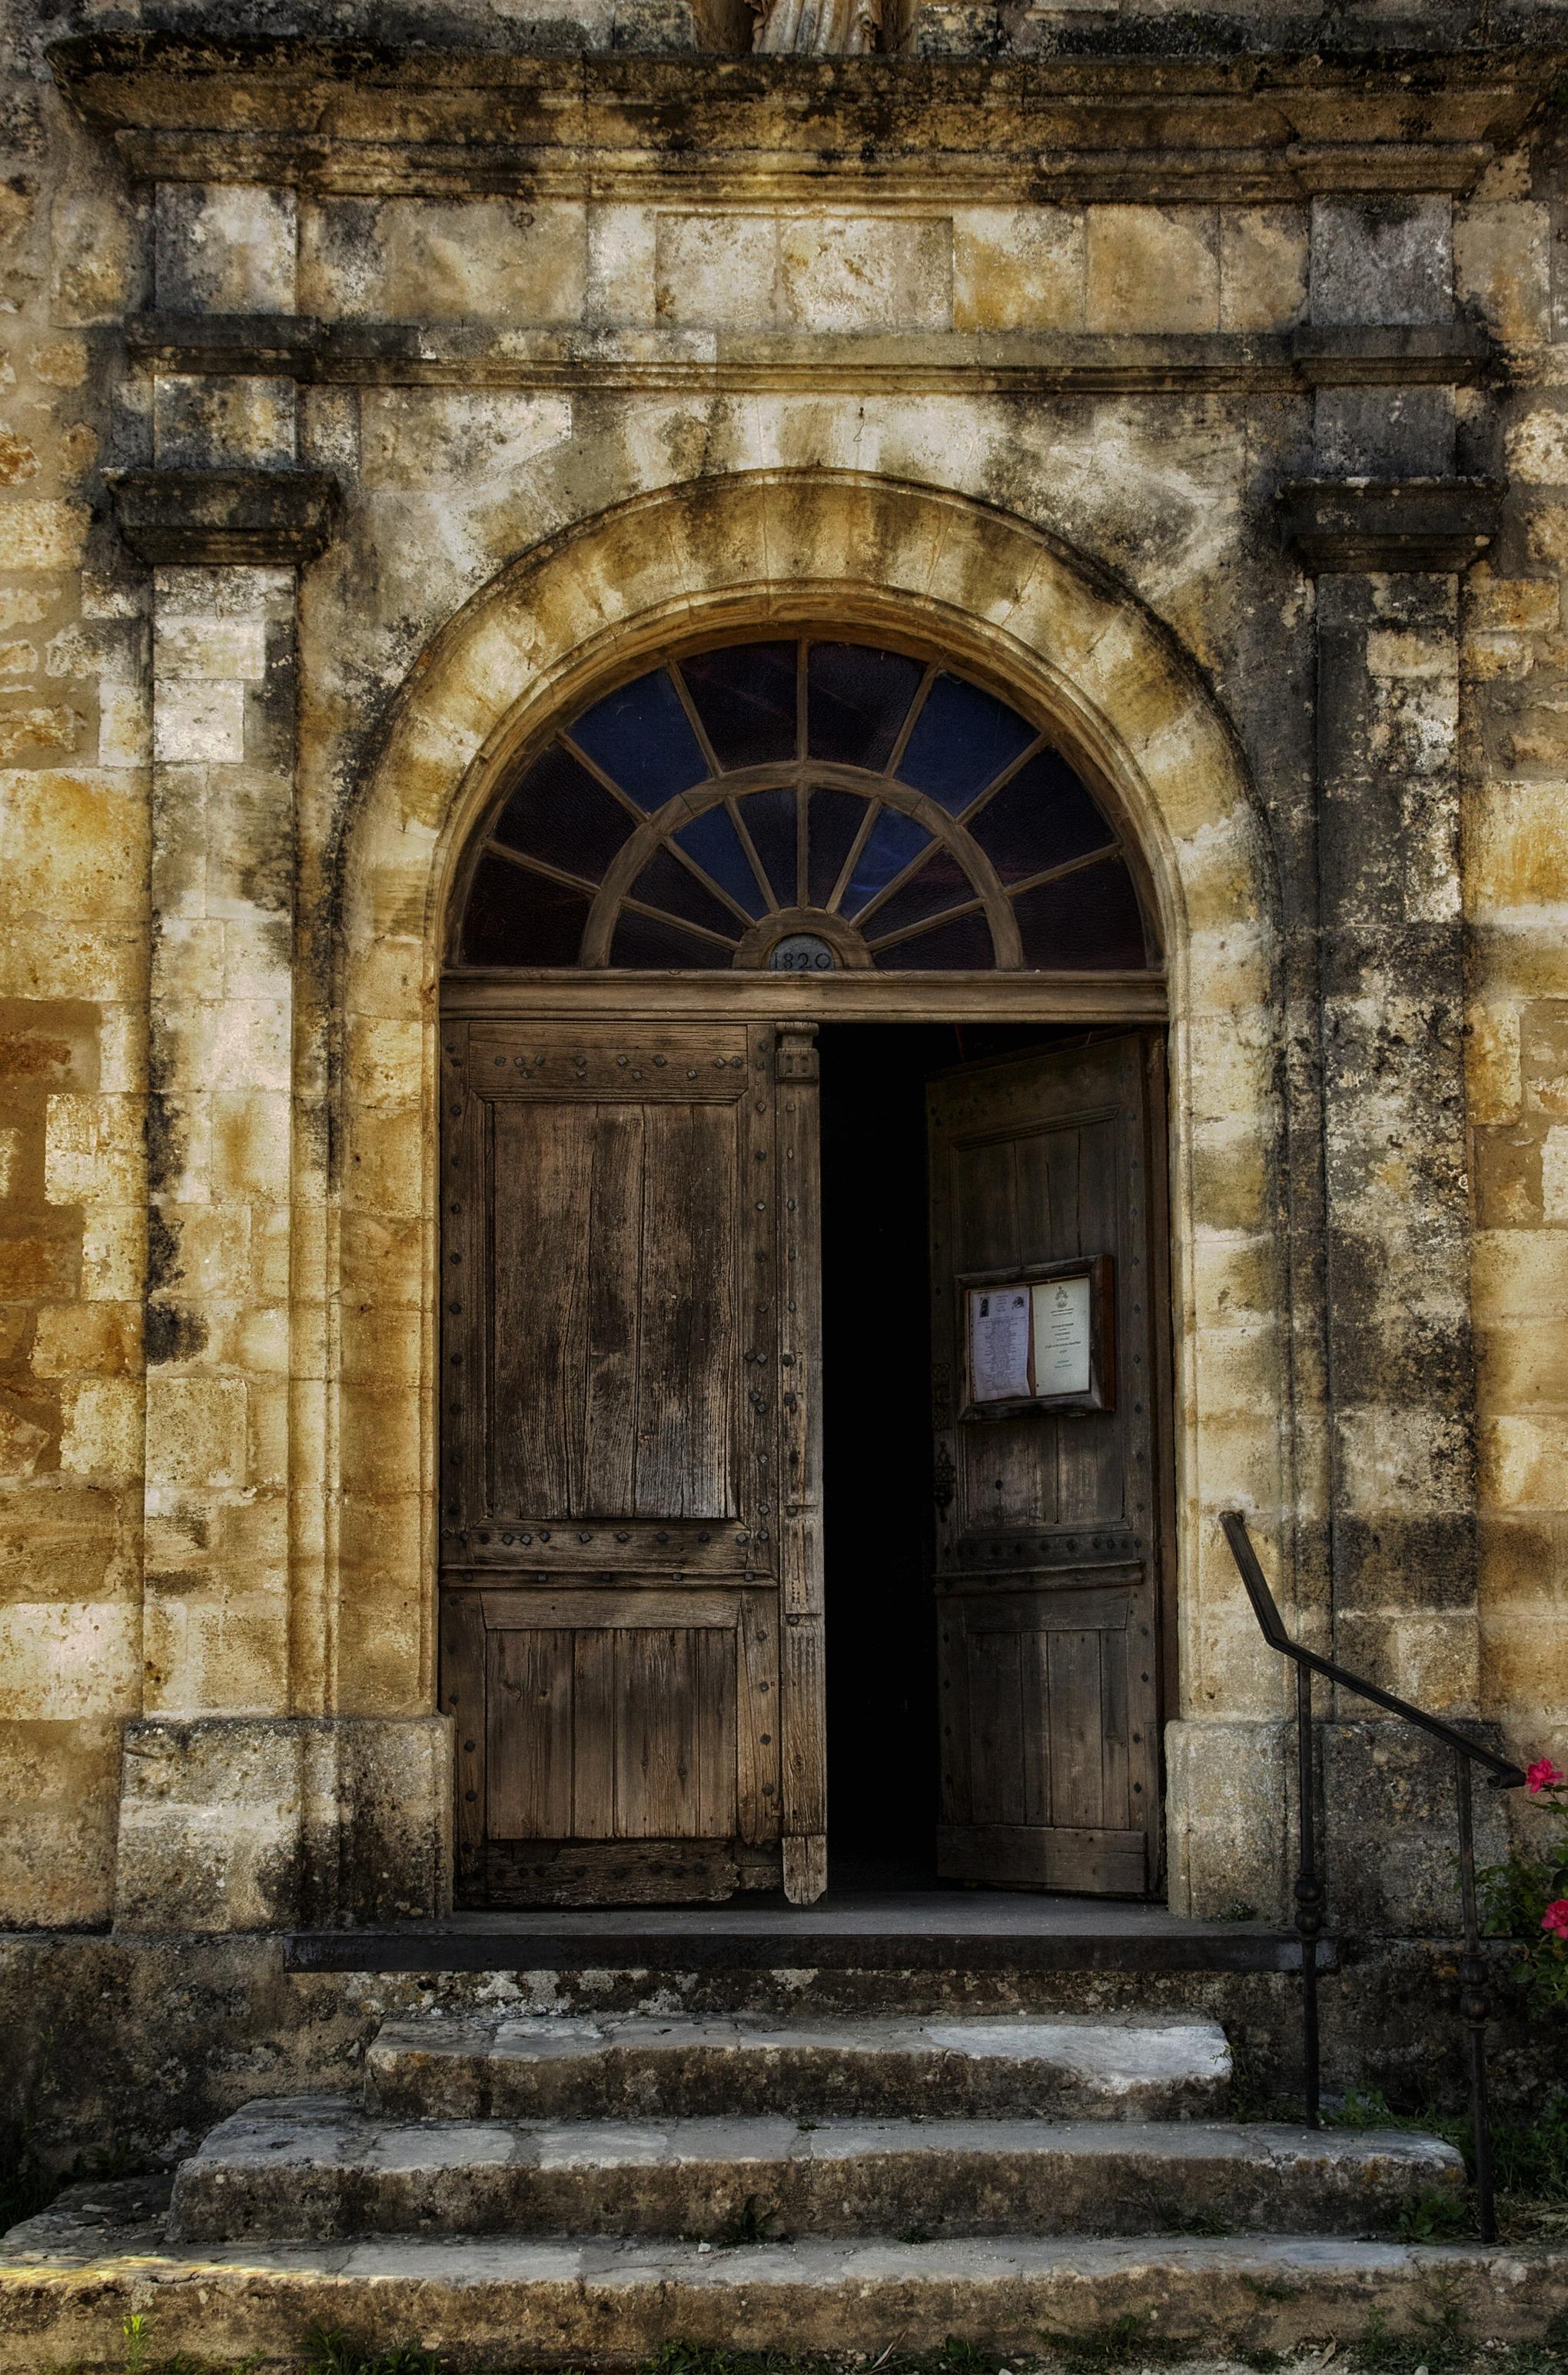 Rock Architecture Wood Window Building Old Wall France Arch Entrance Facade  Church Chapel Brick Door Doorway